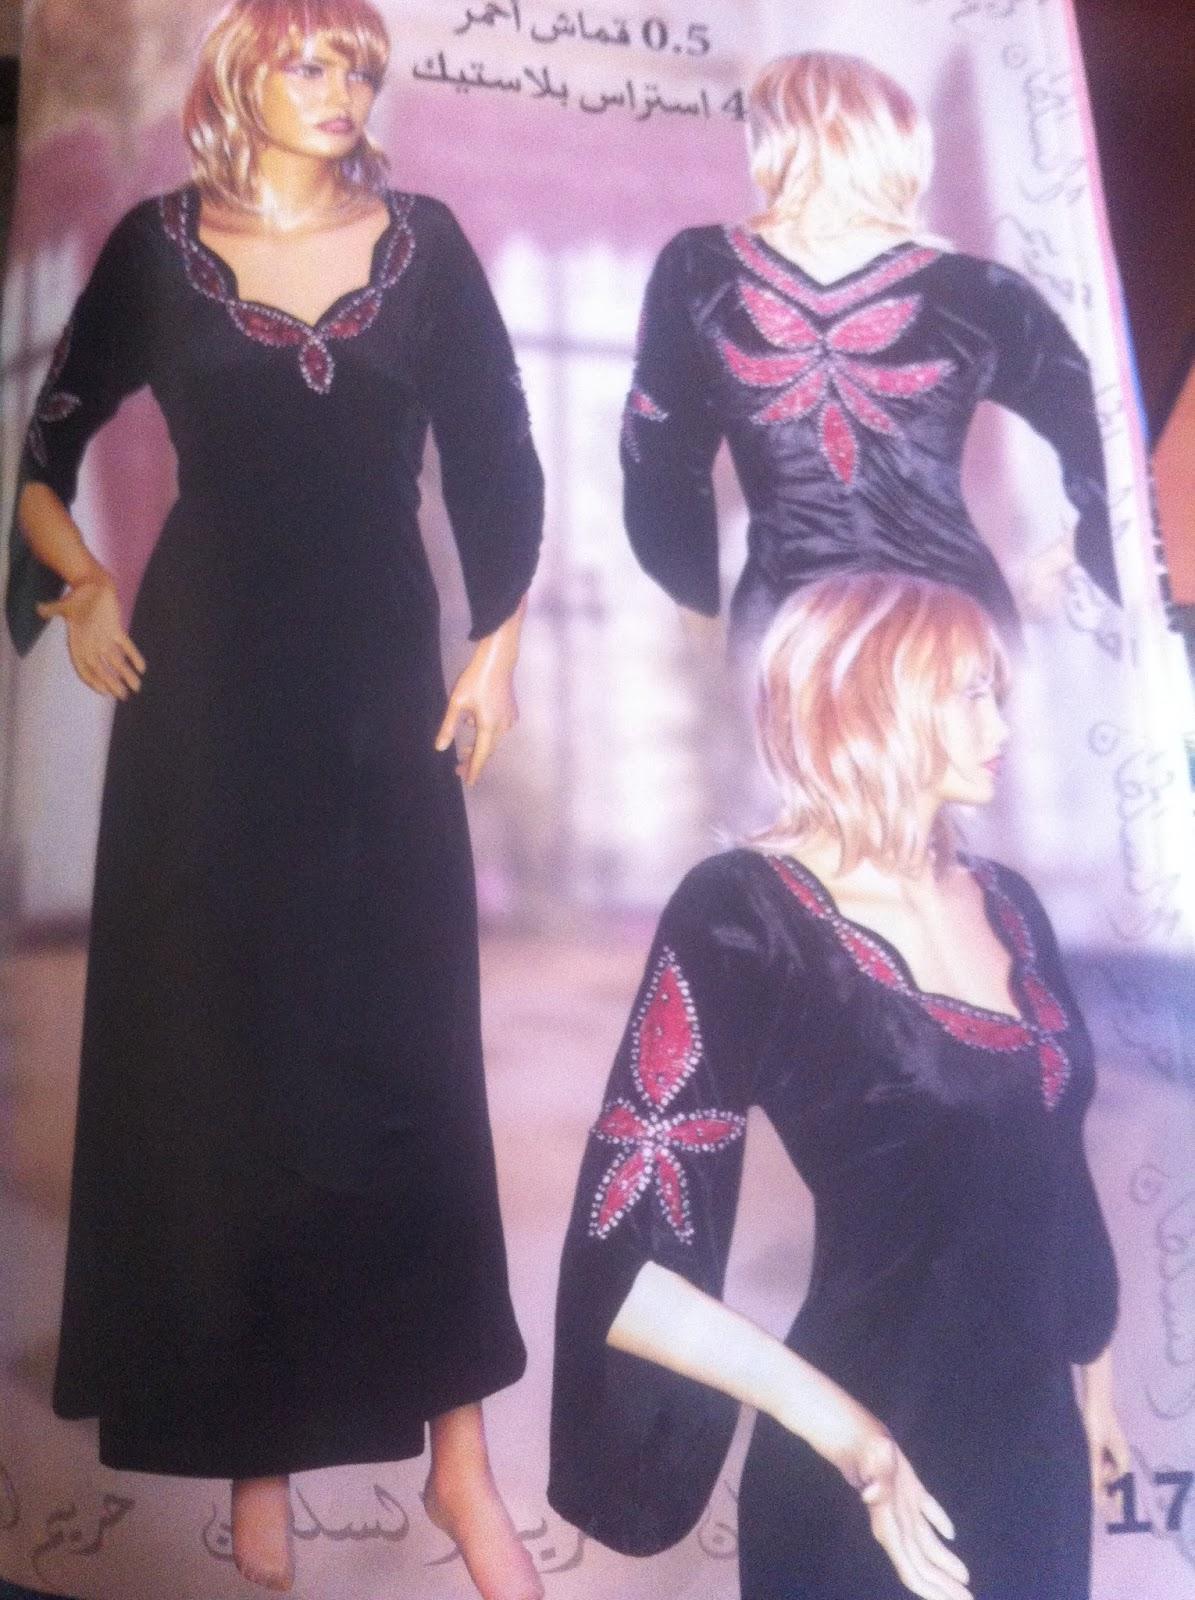 بالصور صور قندورة بيزو بيزو للاعراس قندورة شيك , اجمل قنادر رائعه 4559 8